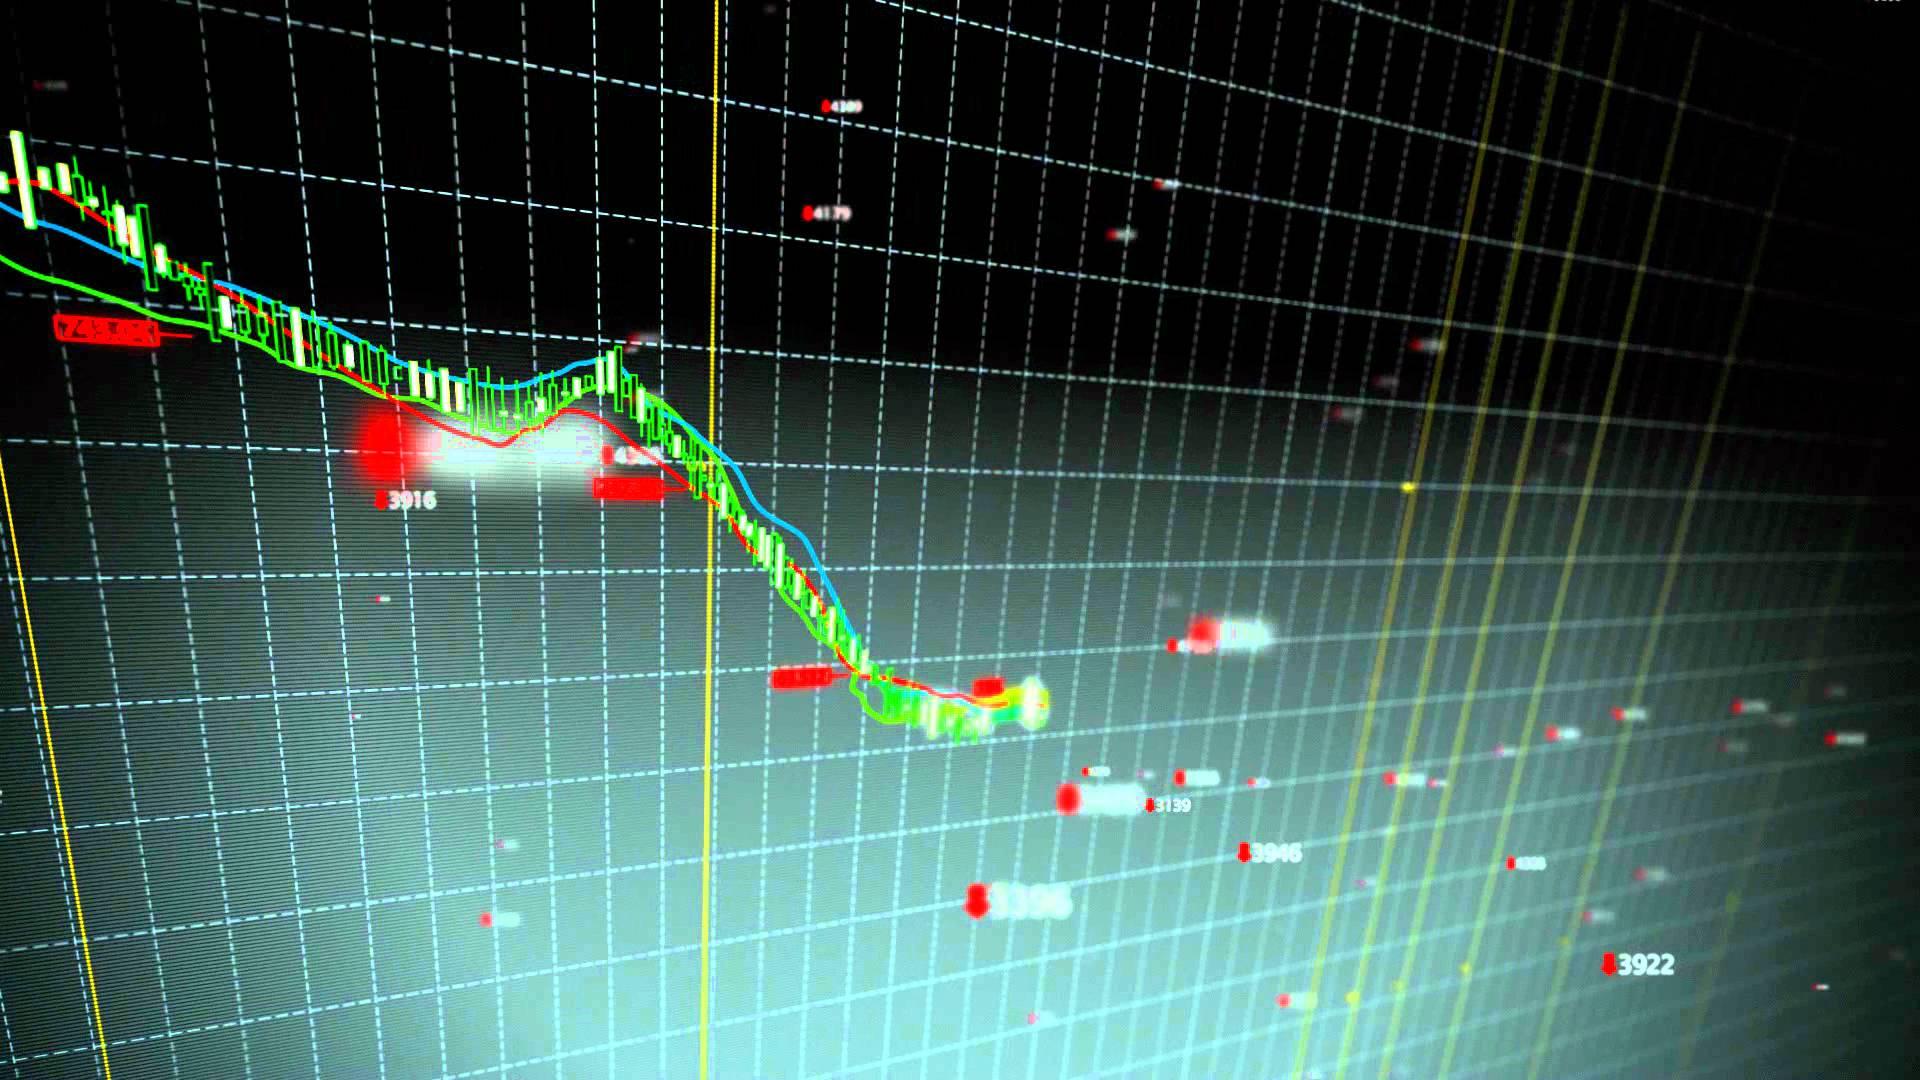 Stock Index falling 001